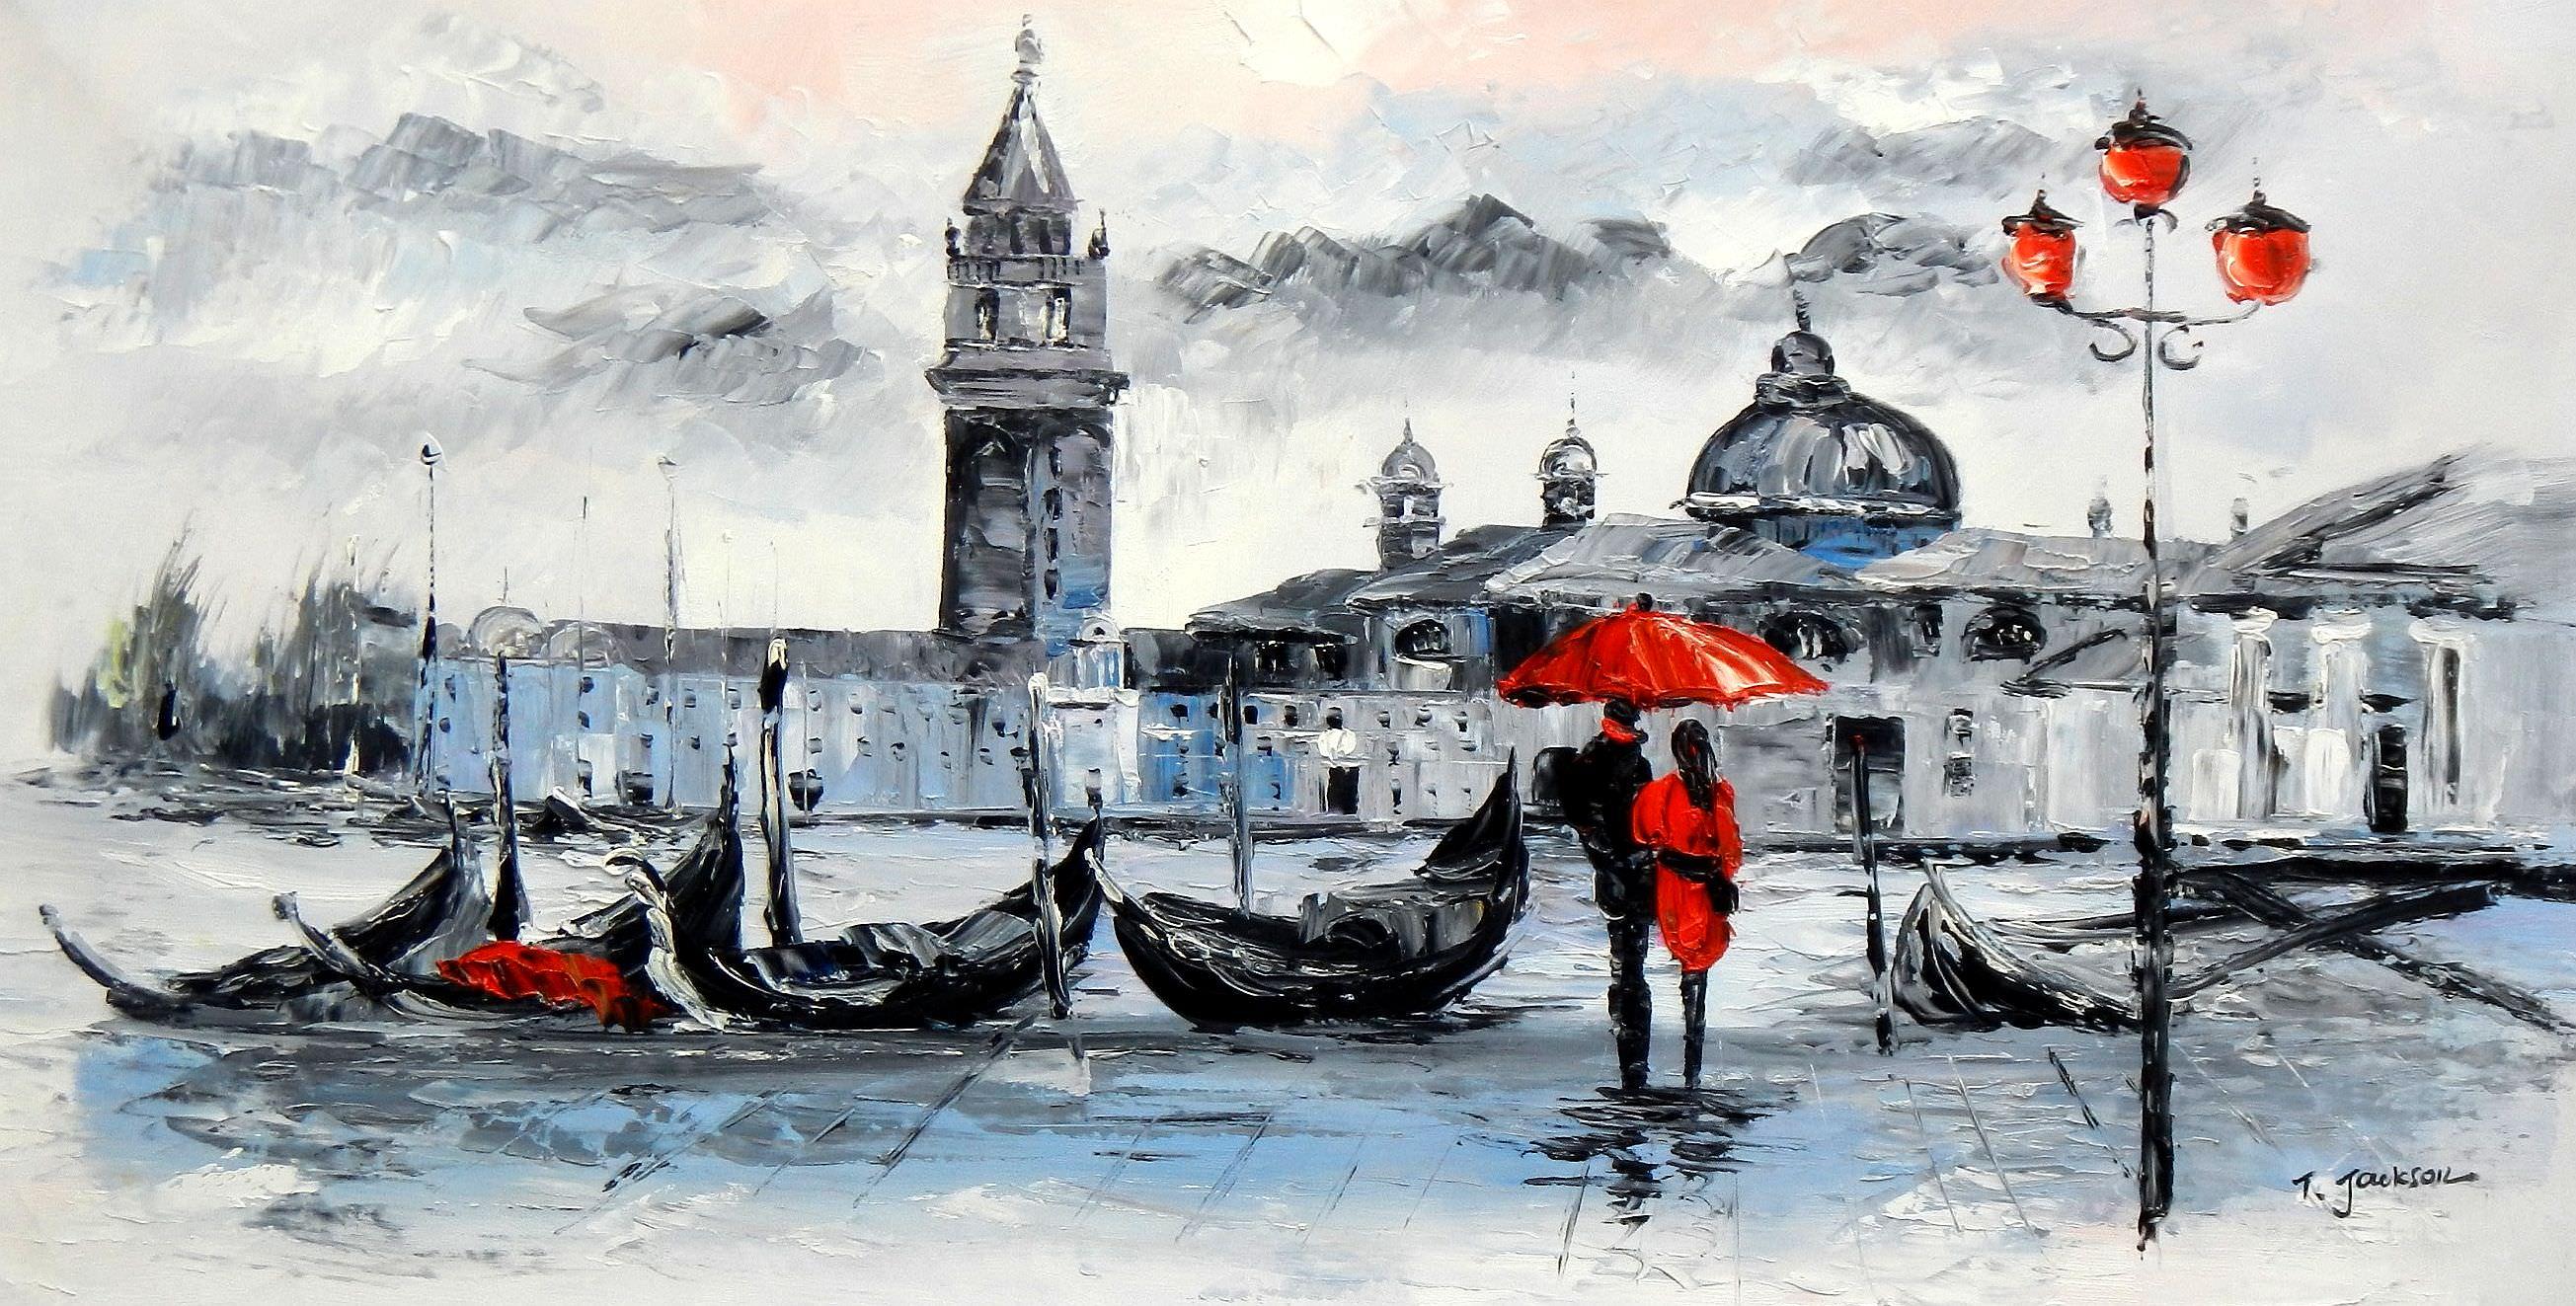 Venedig am Dogenpalast f95851 60x120cm Ölgemälde handgemalt